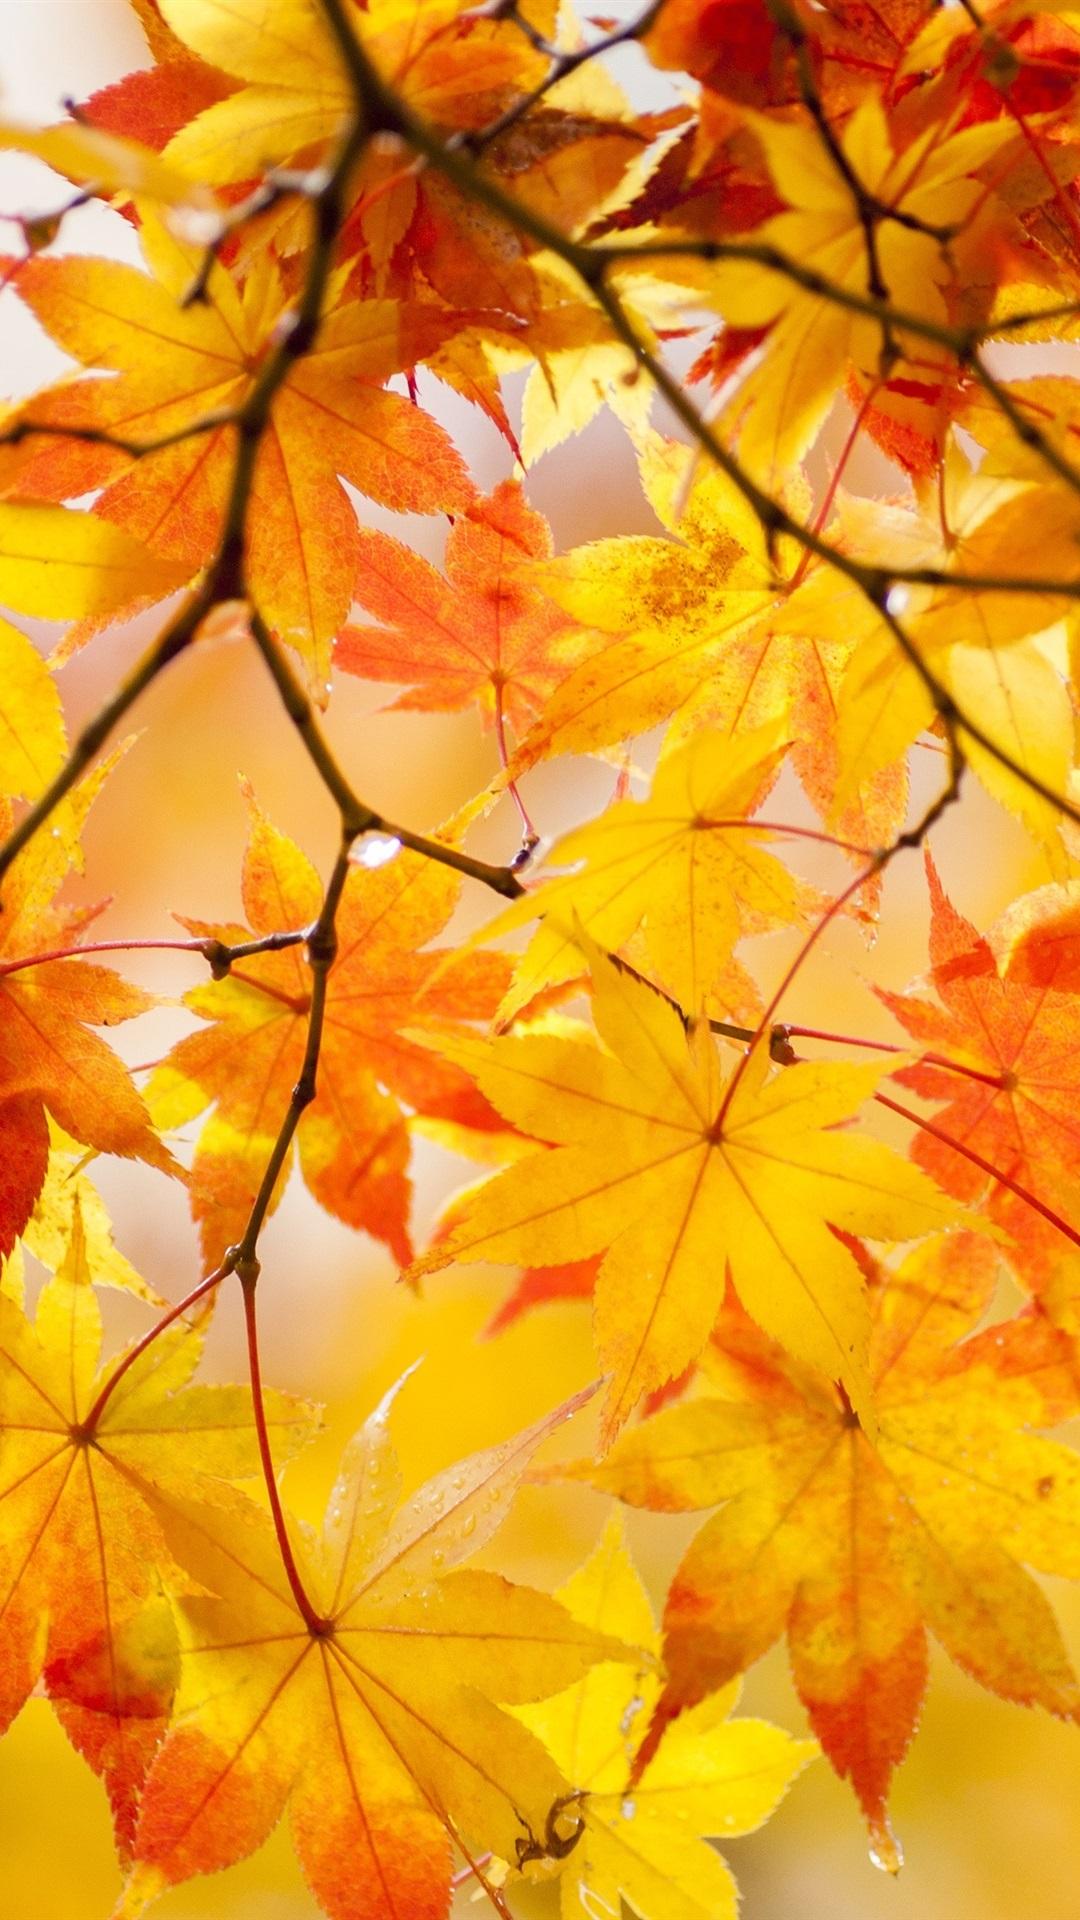 Yellow Maple Leaves Tree Beautiful Autumn 1080x1920 Iphone 8 7 6